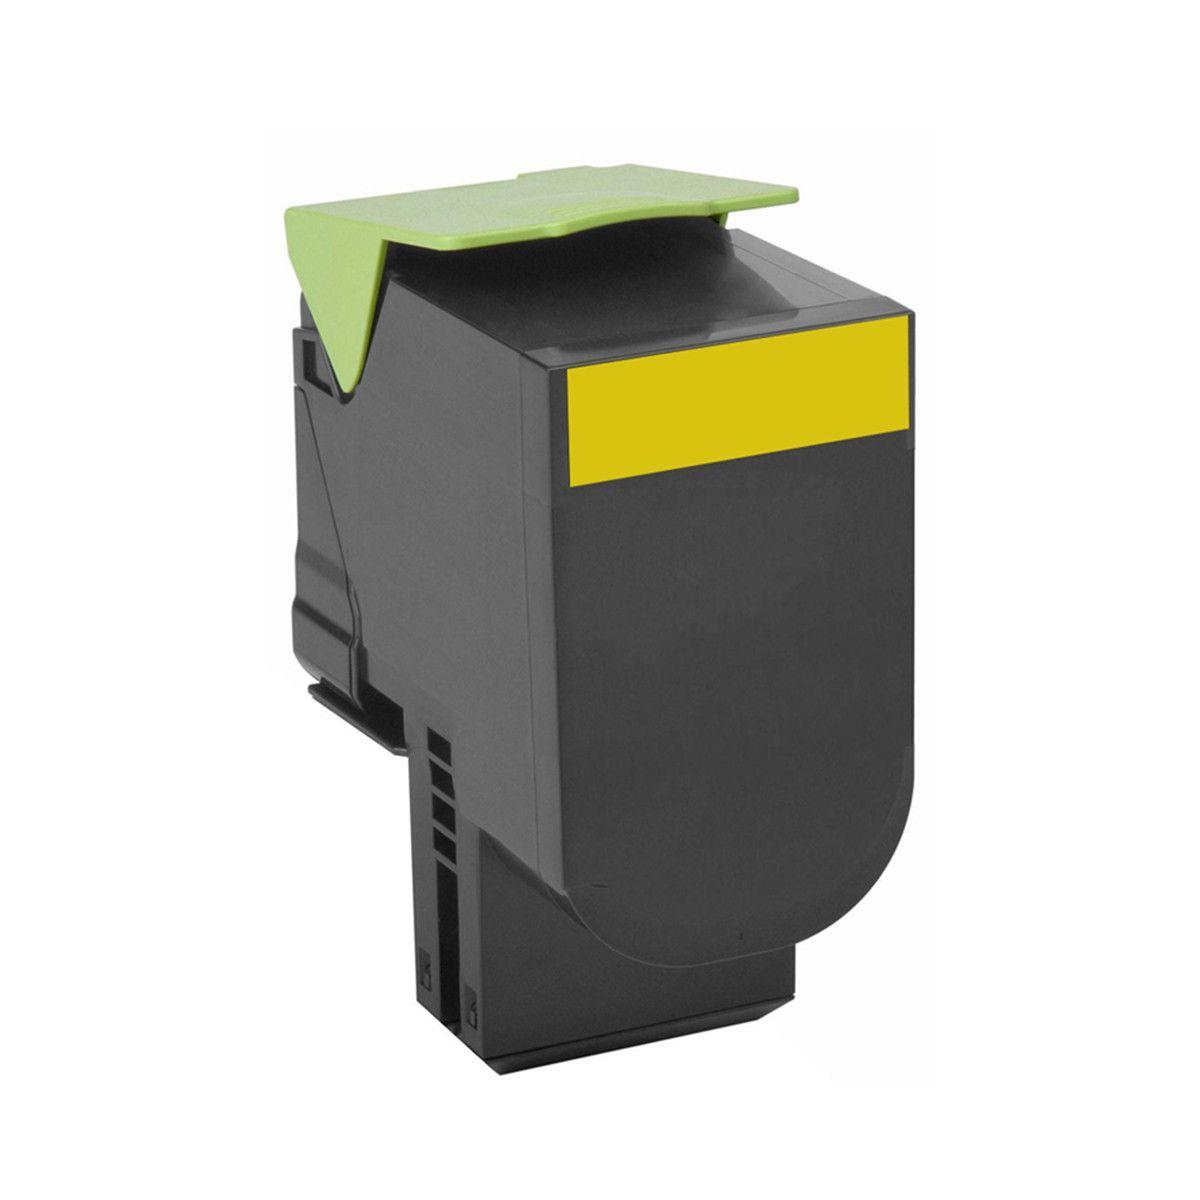 KIT 04 TONERS COMPATÍVEIS COM LEXMARK 80C8SK0 CX/CS310 CX/CS410 CX/CS510 4k e 3k B/M/C/Y - Cartucho & Cia